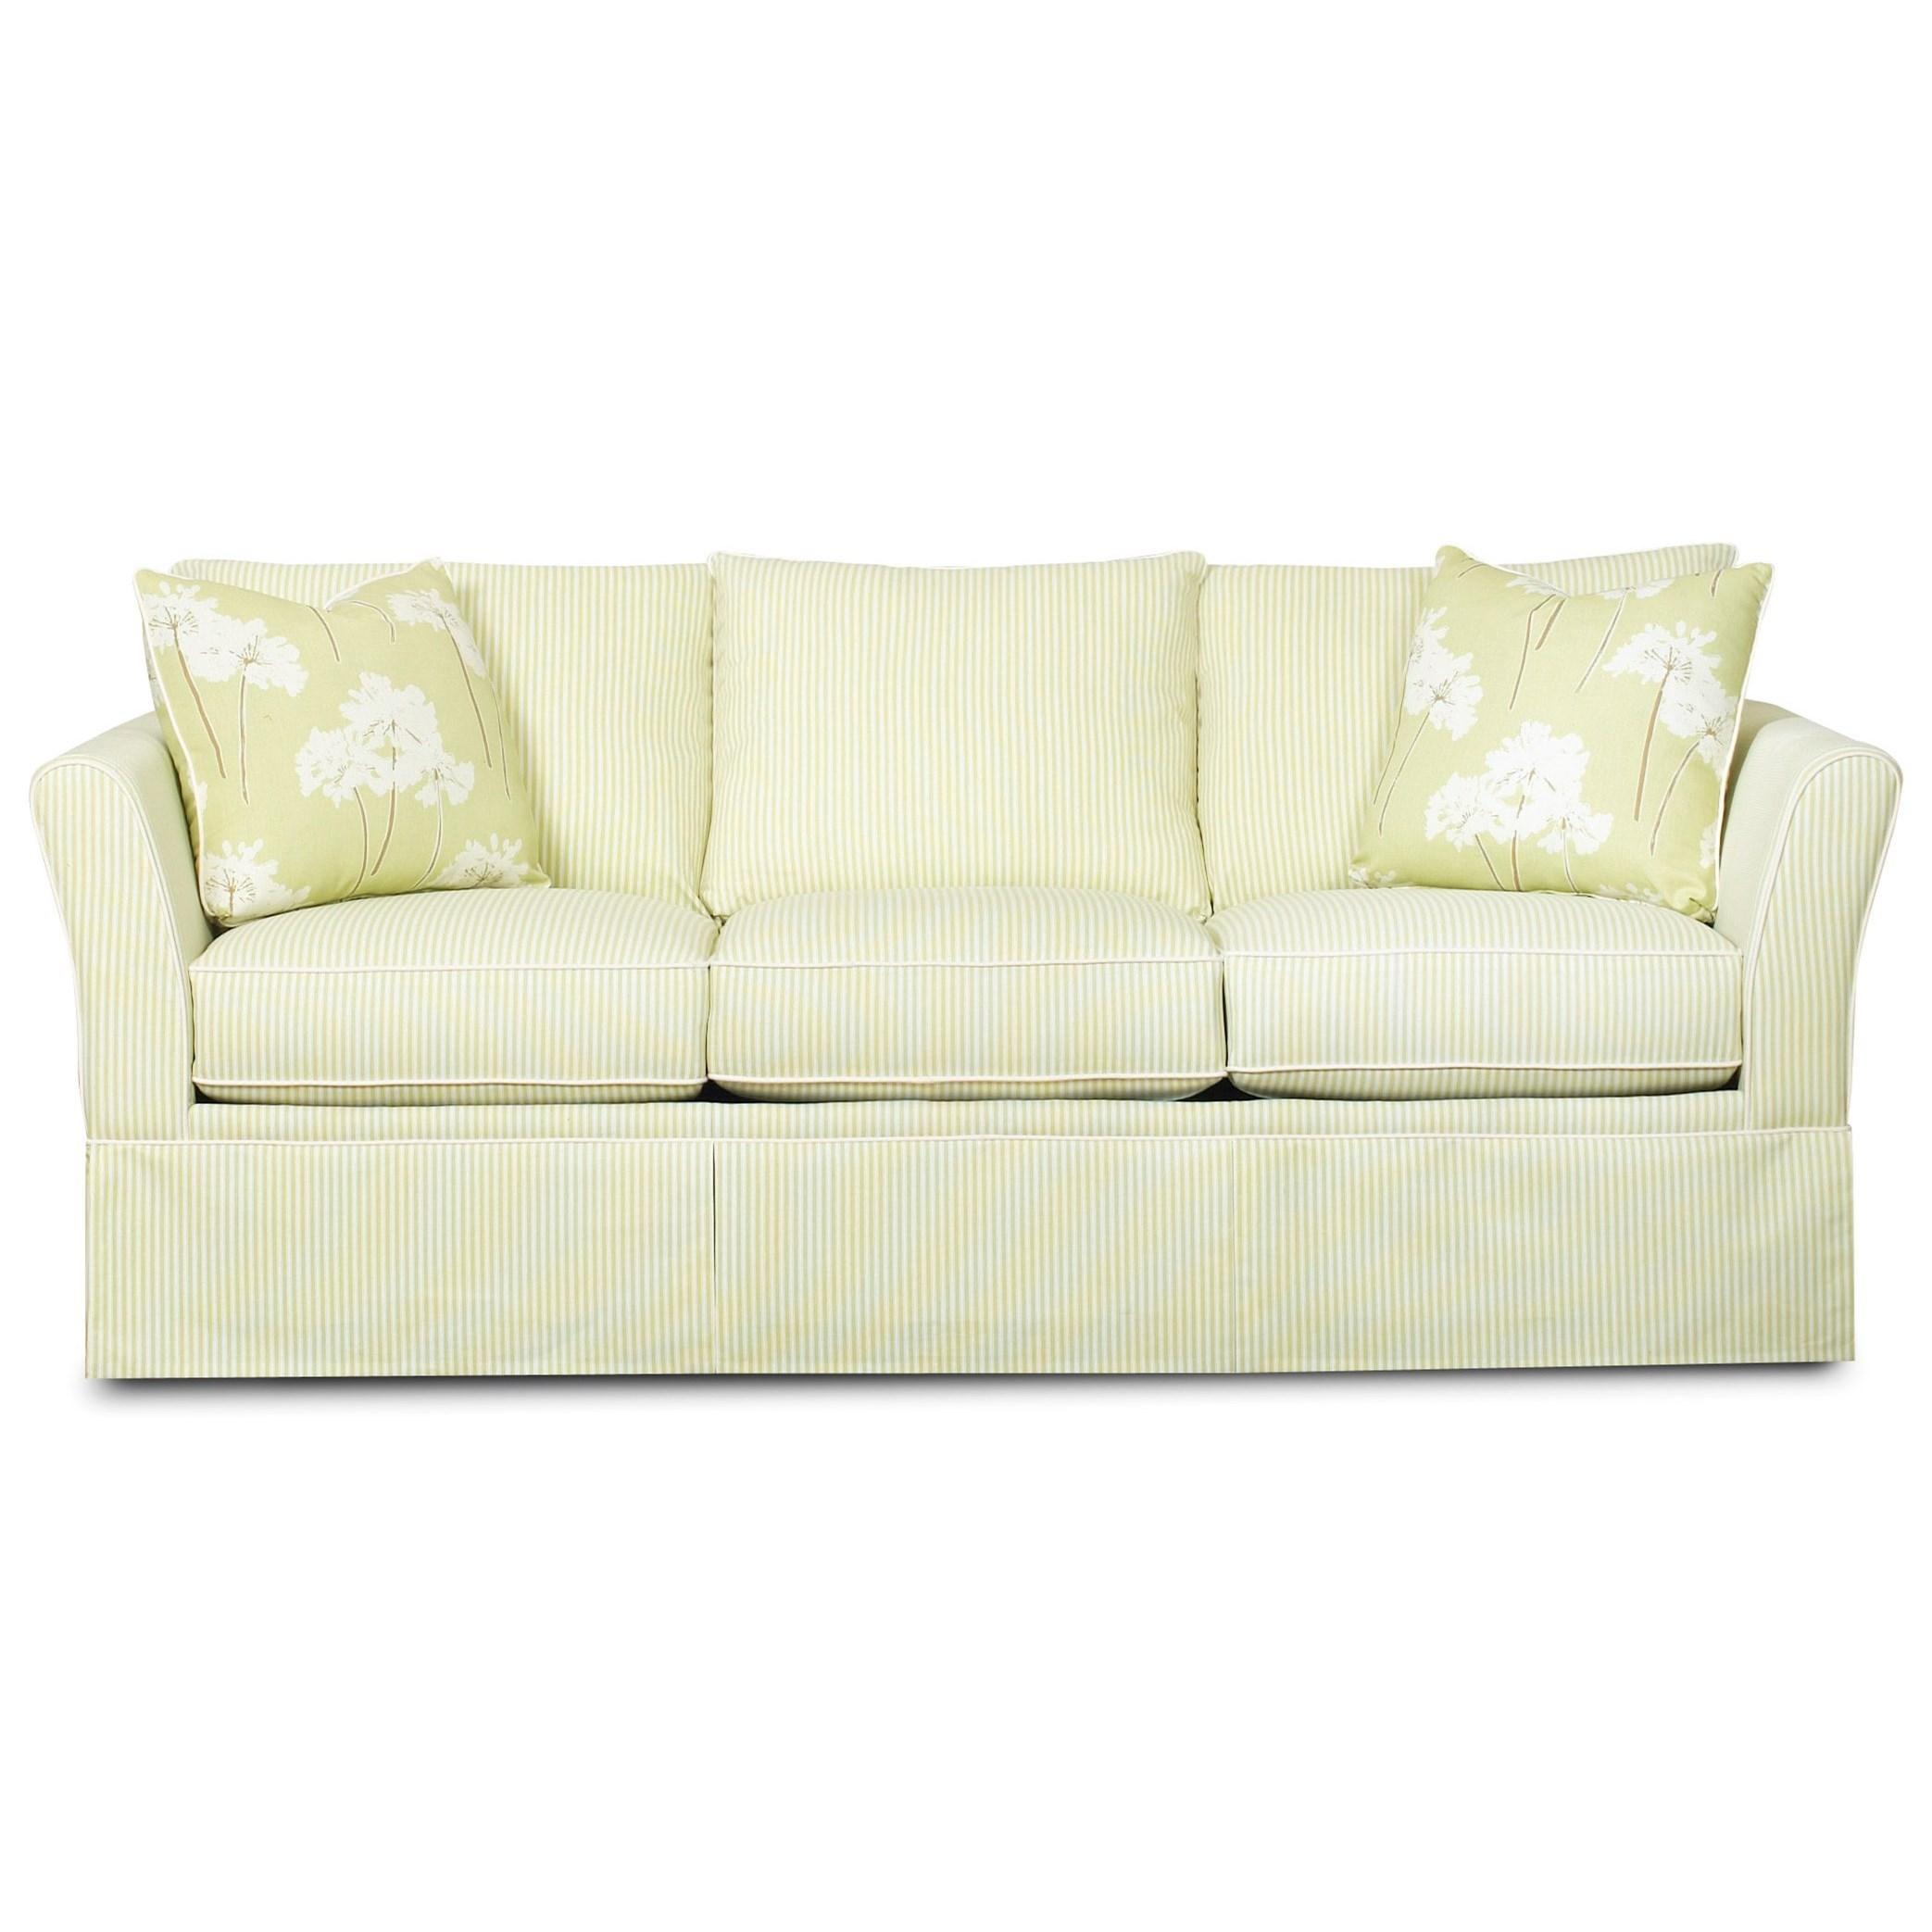 Ramona Sofa by Klaussner at Value City Furniture